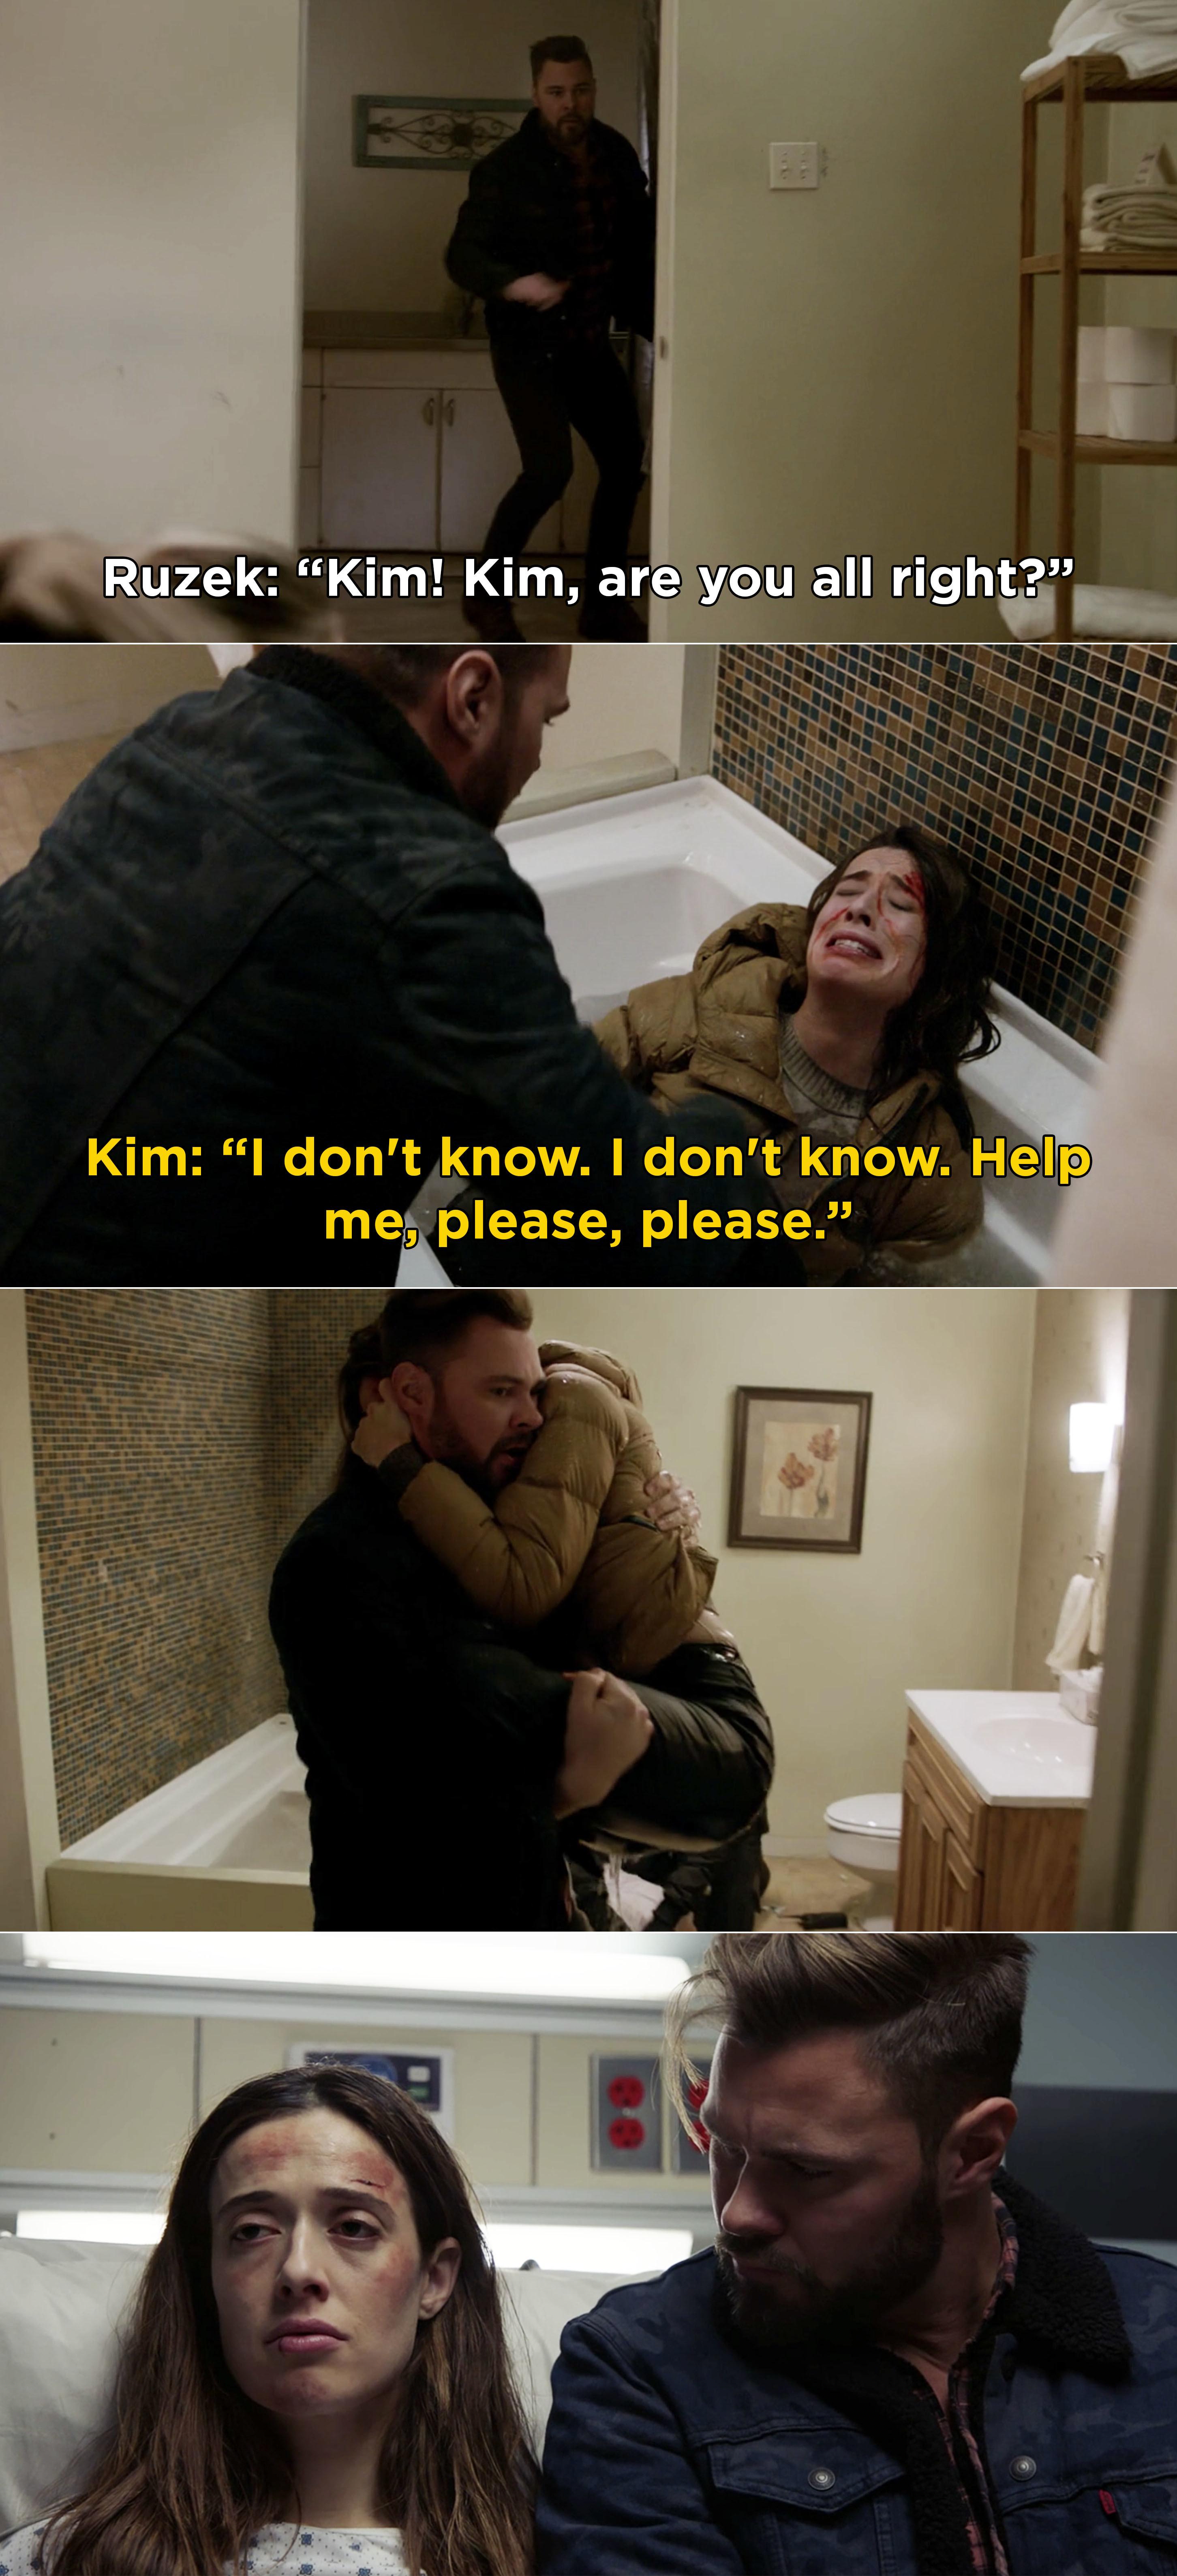 Ruzek picking up Kim while she cries in a bathtub